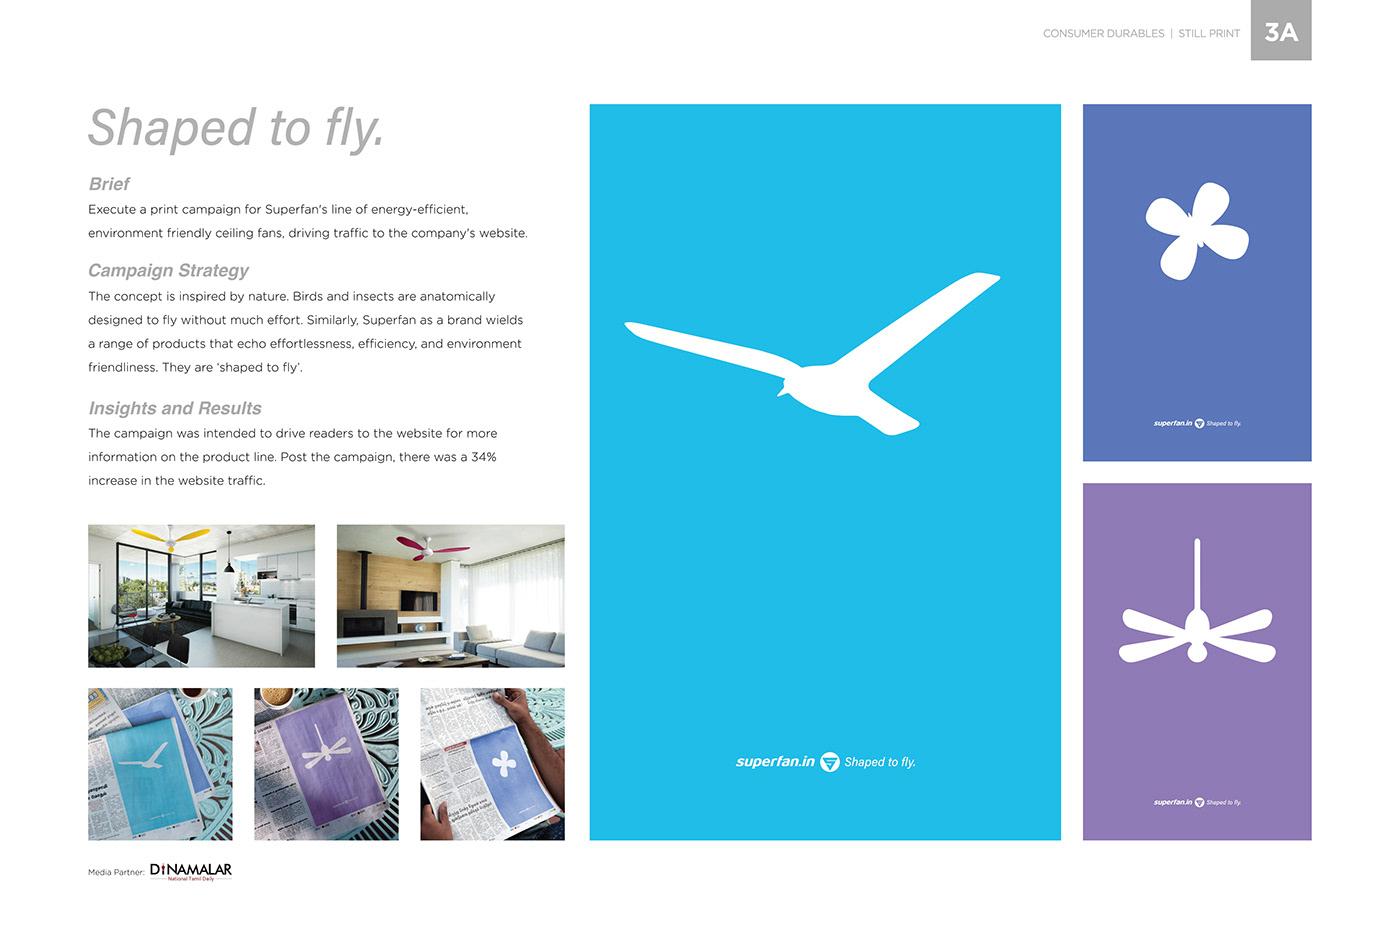 Image may contain: airplane and aircraft